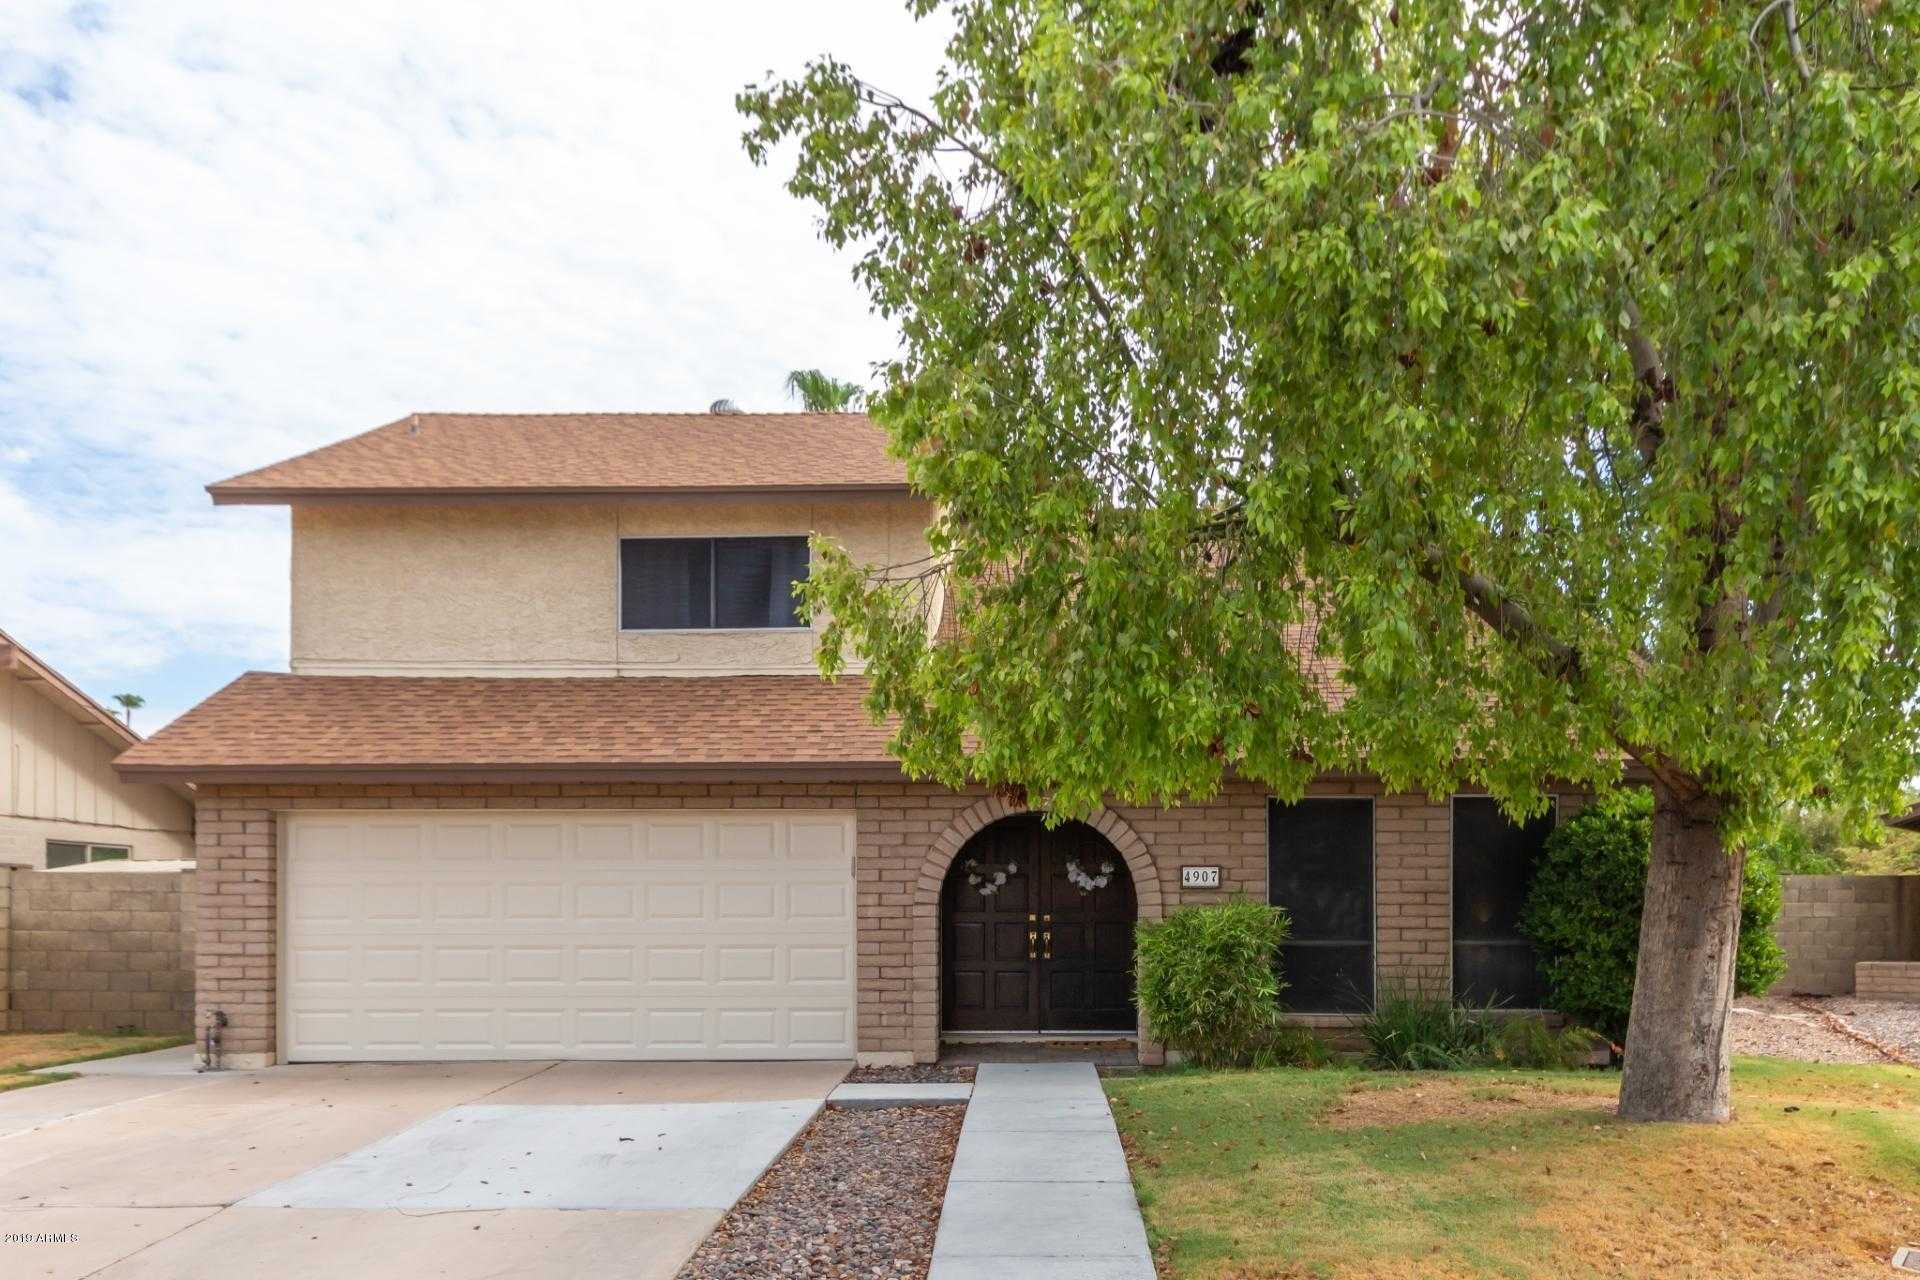 $320,000 - 4Br/3Ba - Home for Sale in Bellair Unit 3 Lt 329-430 436-531 Tr 50 53-63, Glendale